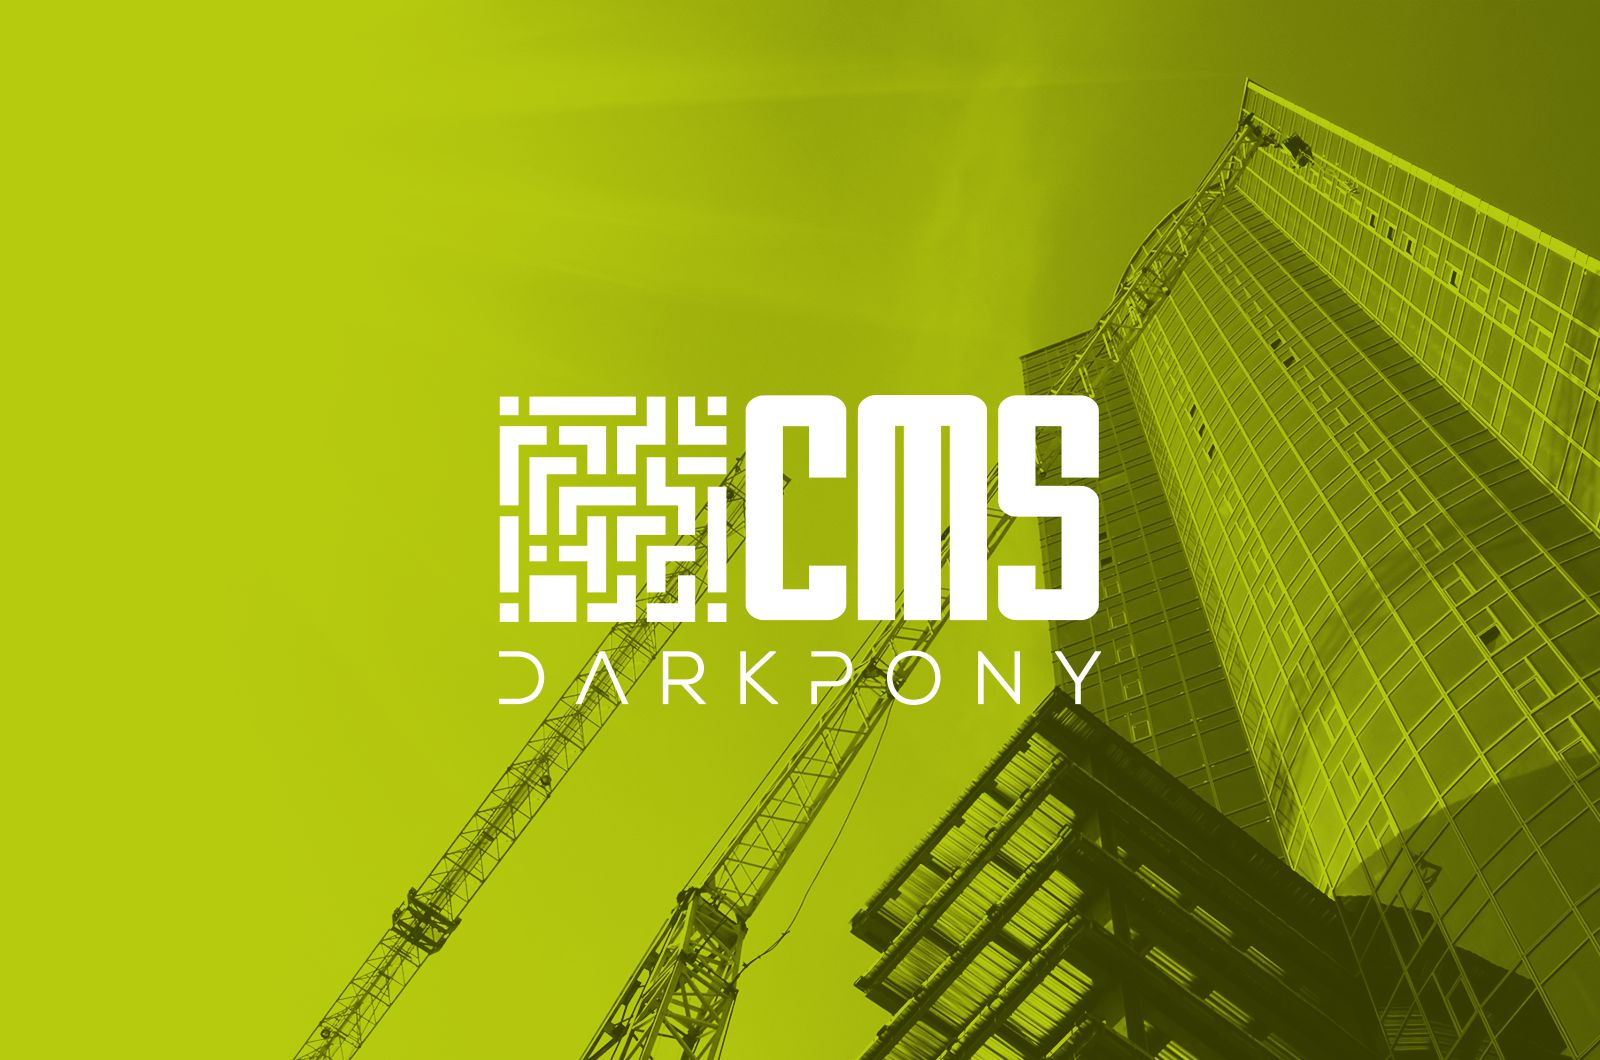 DarkponyCMS